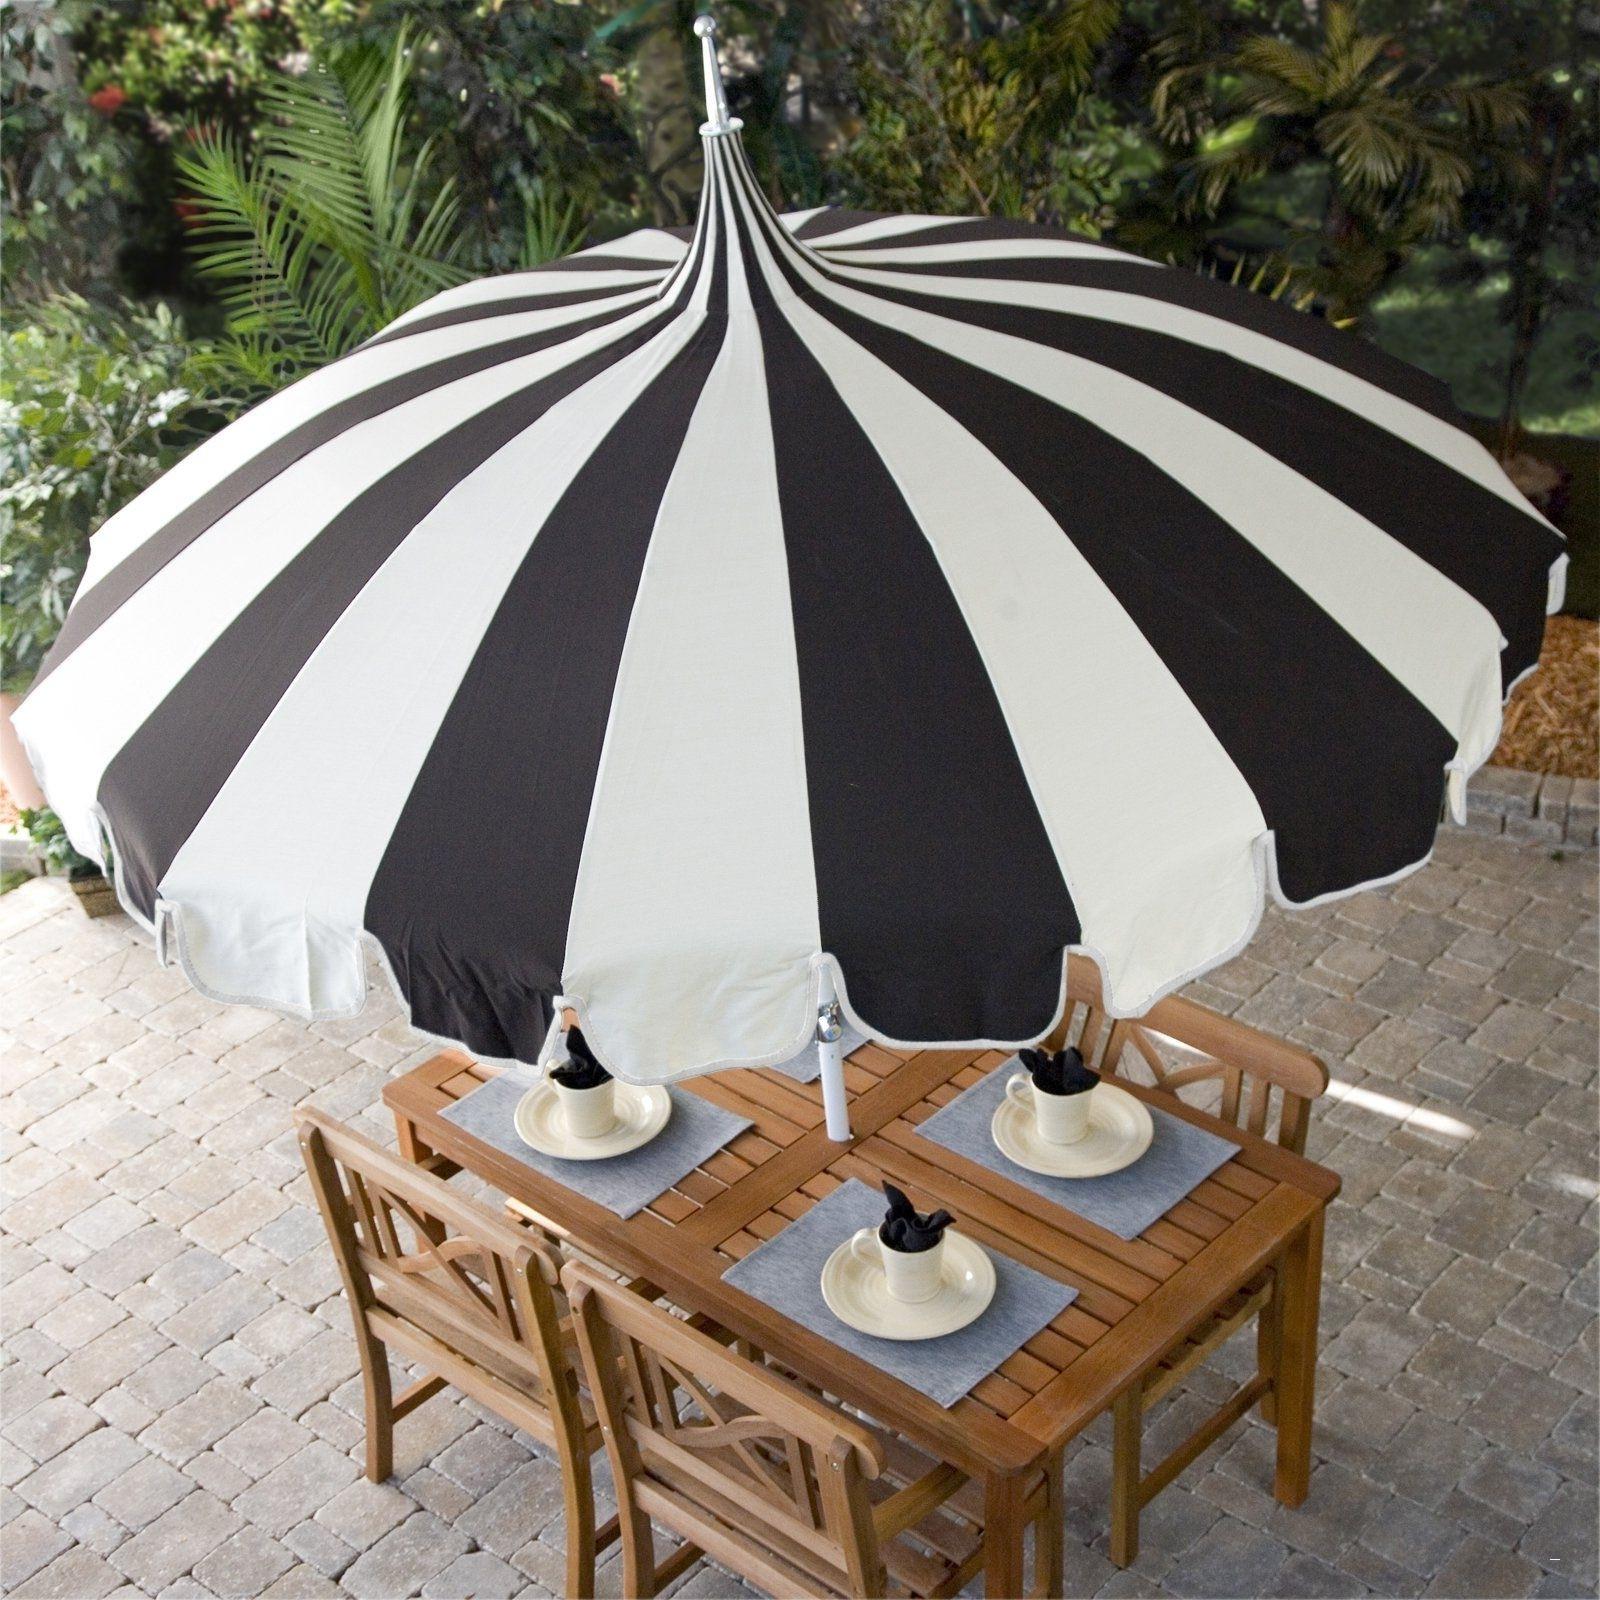 Popular Striped Patio Umbrellas Regarding 20 Amazing Striped Patio Umbrella Patio Furniture Concept Of 6 Ft (View 14 of 20)